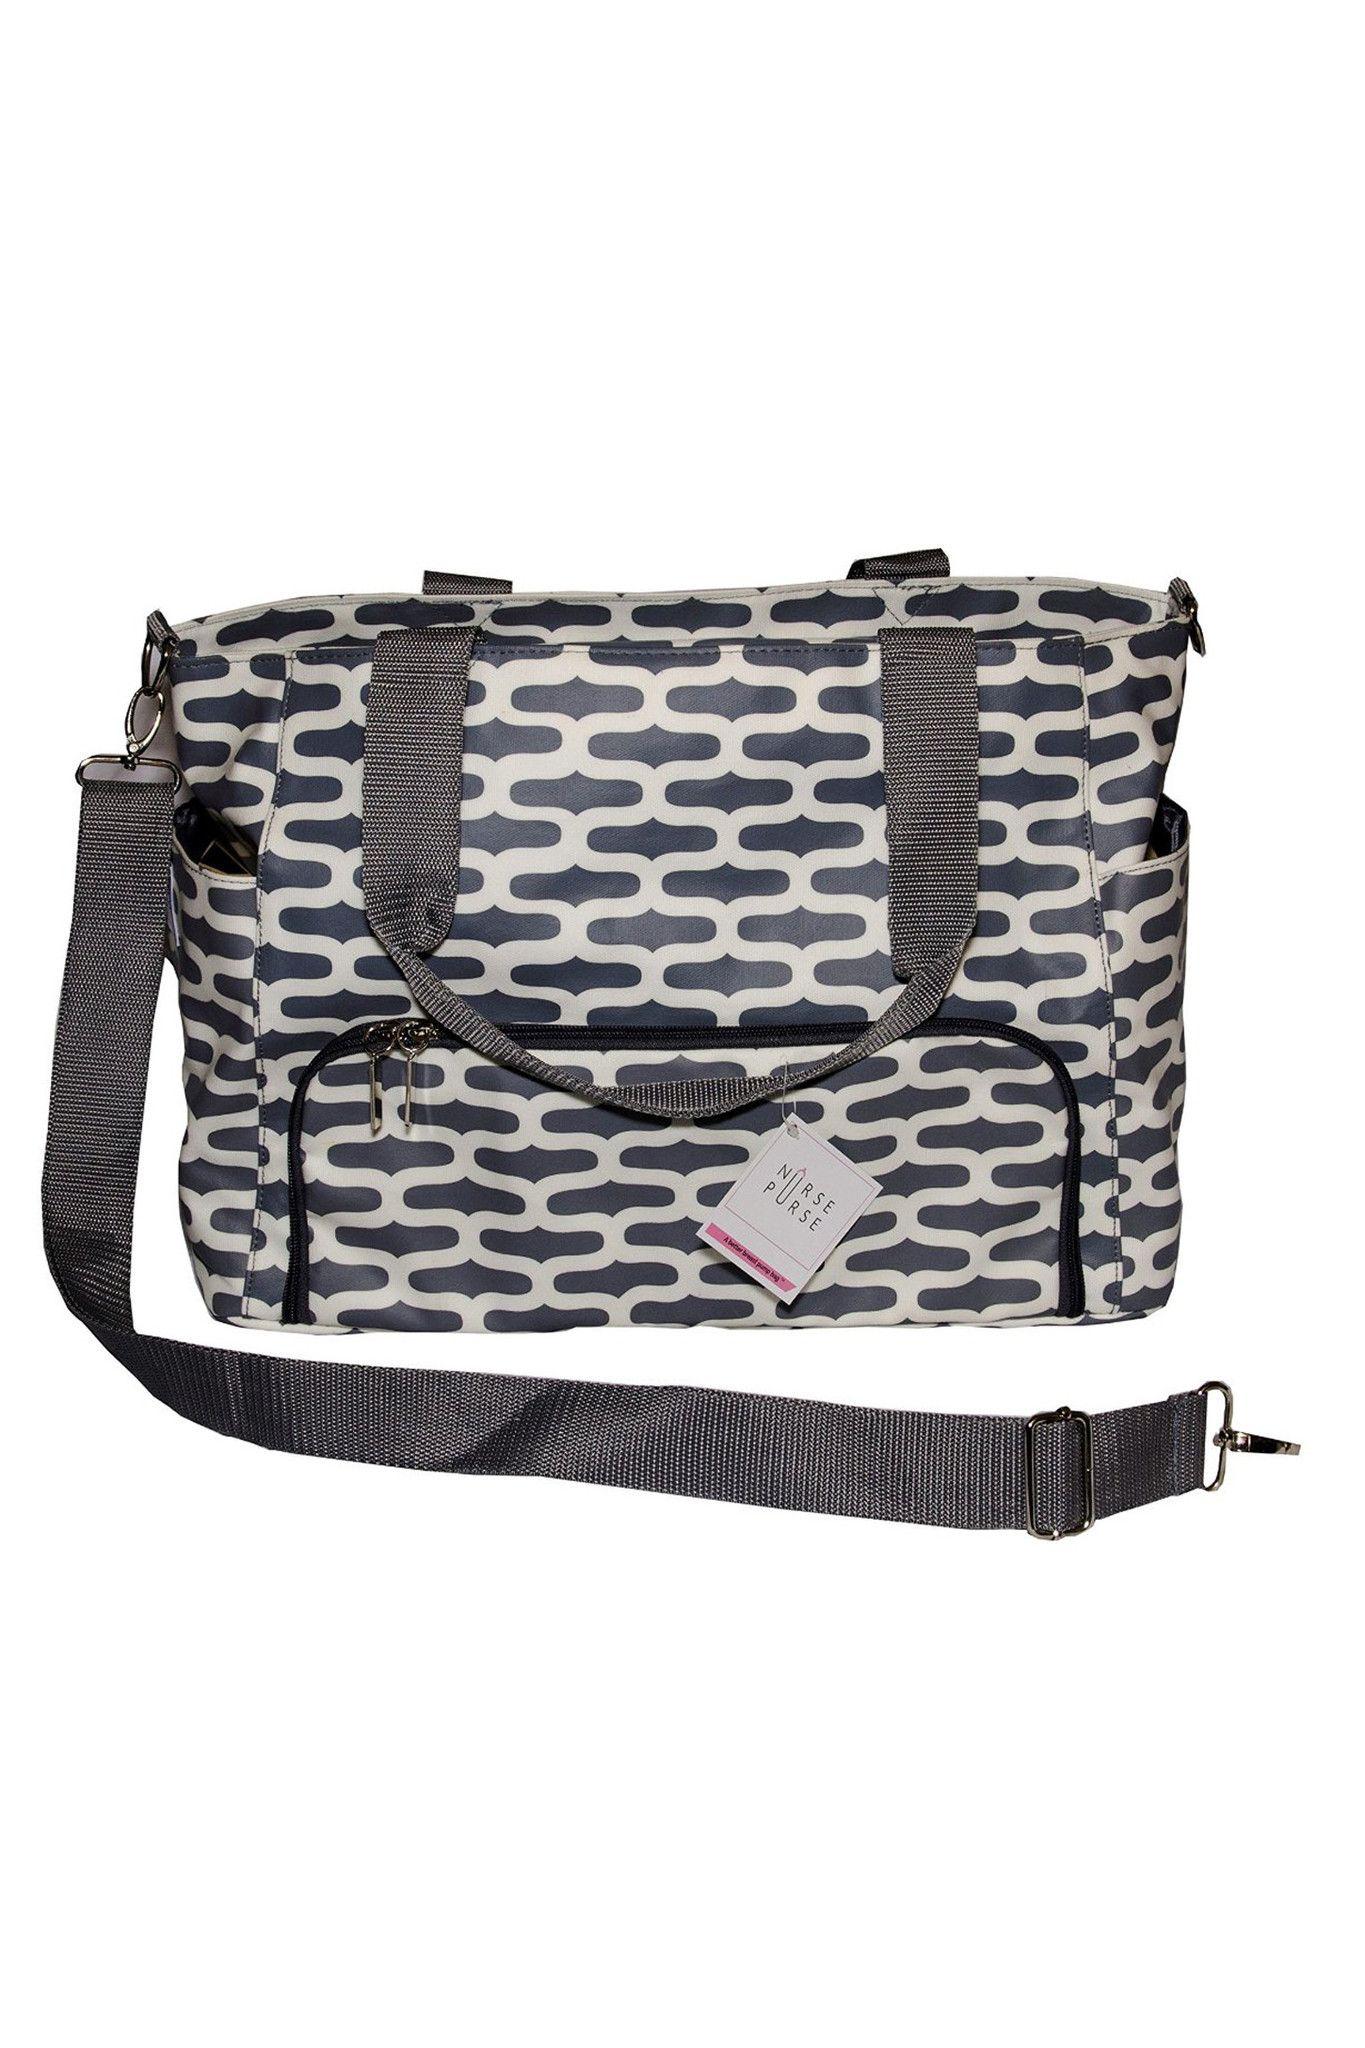 Fern Breast Pump Bag by Nurse Purse. Store your breast pump, breast milk, &  pumping accessories. Shop now! milkandbaby.com